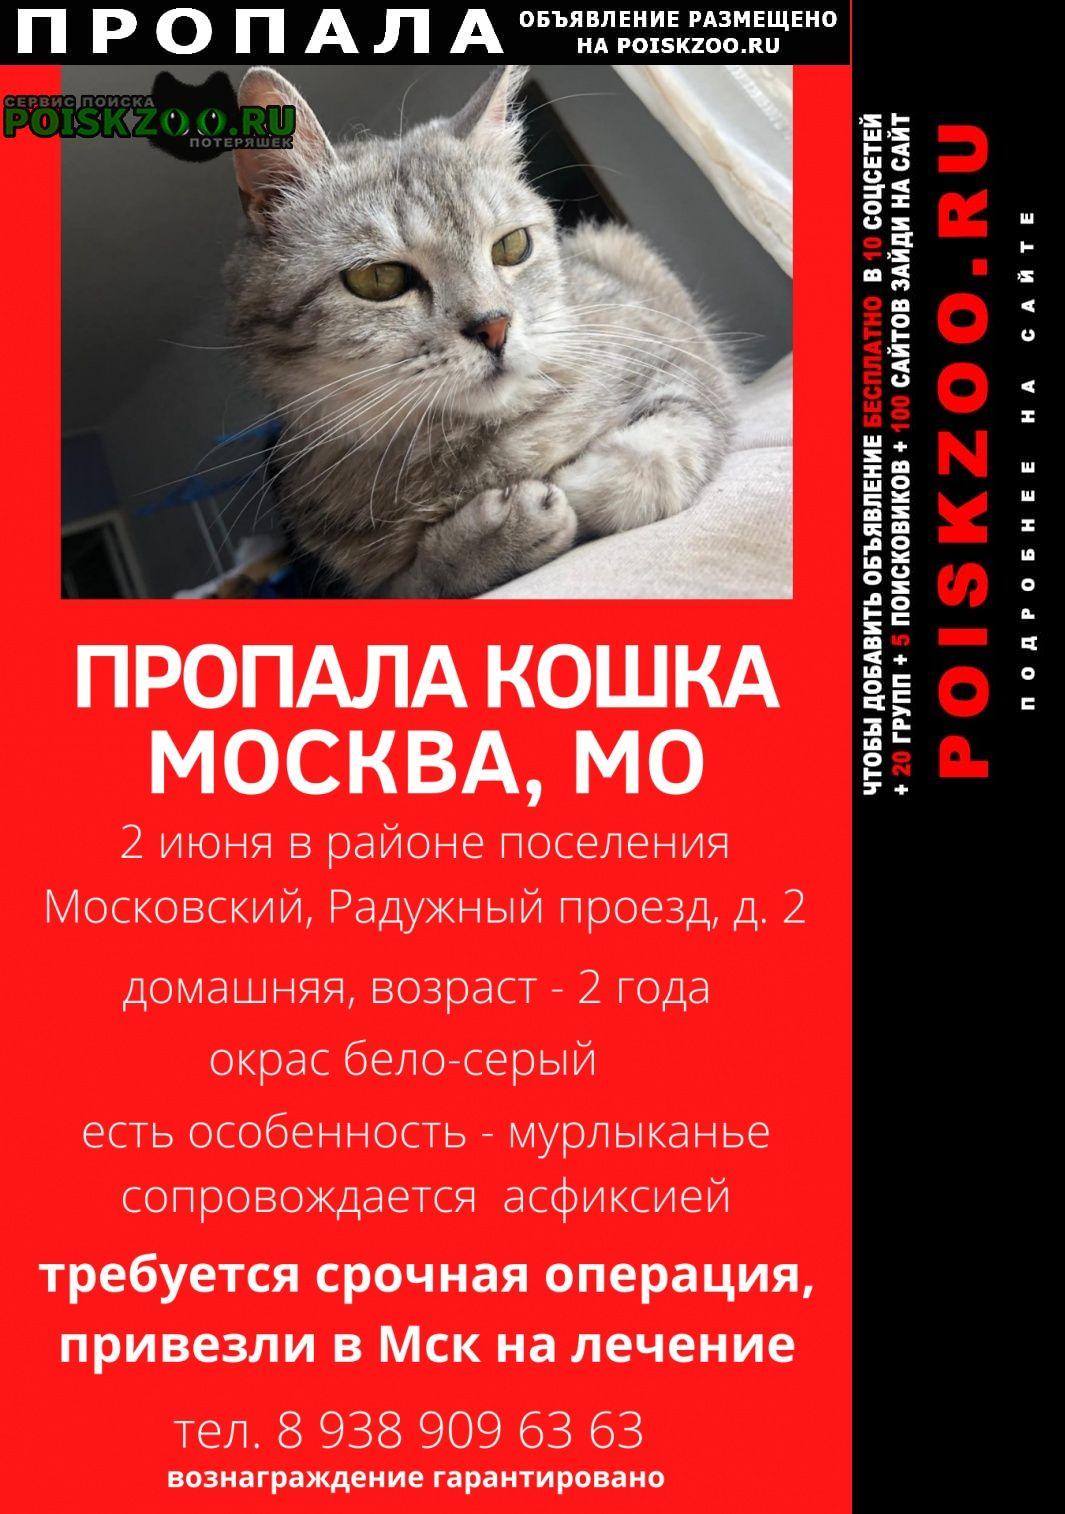 Пропала кошка пос. московский Москва